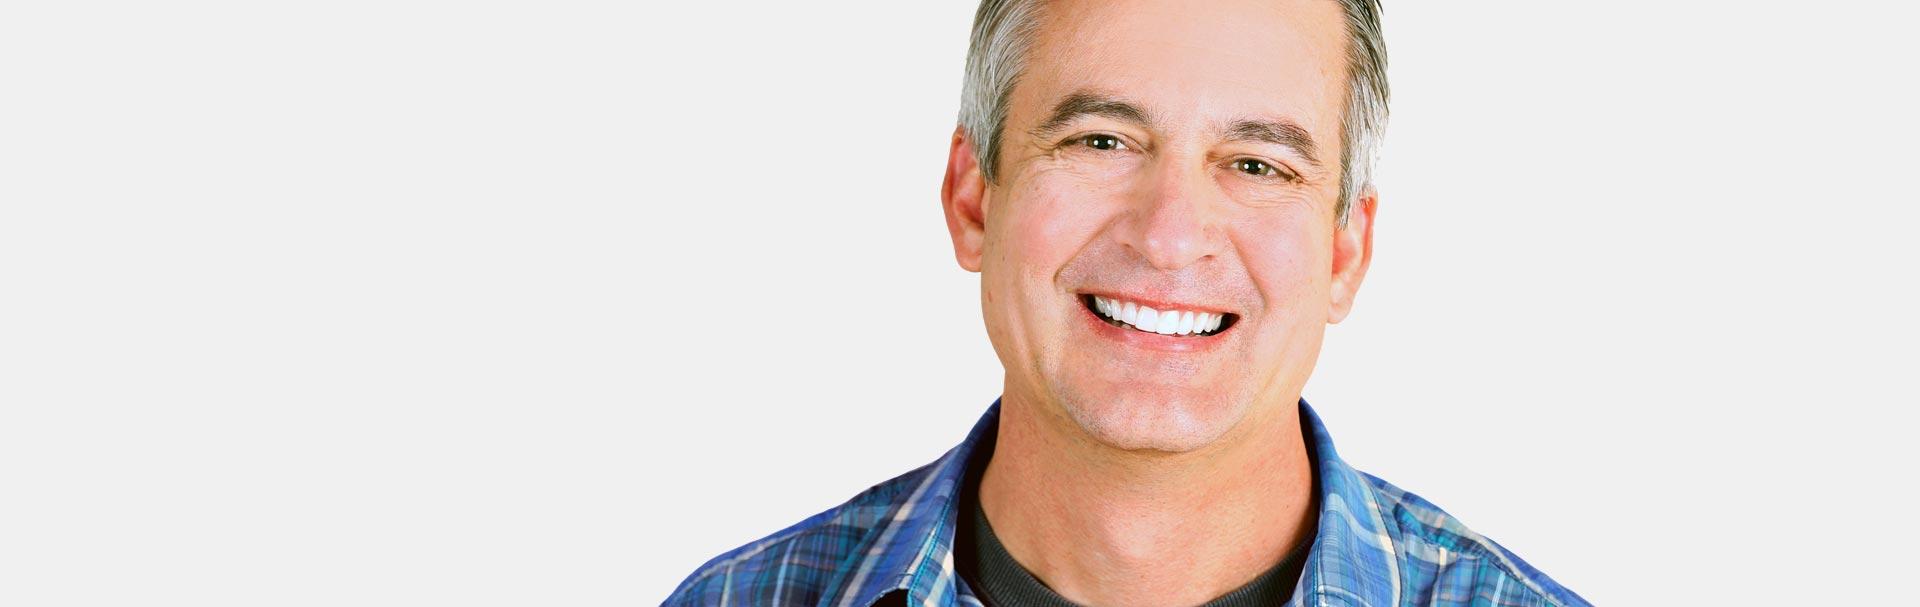 Smiling man after having safe amalgam removal treatment